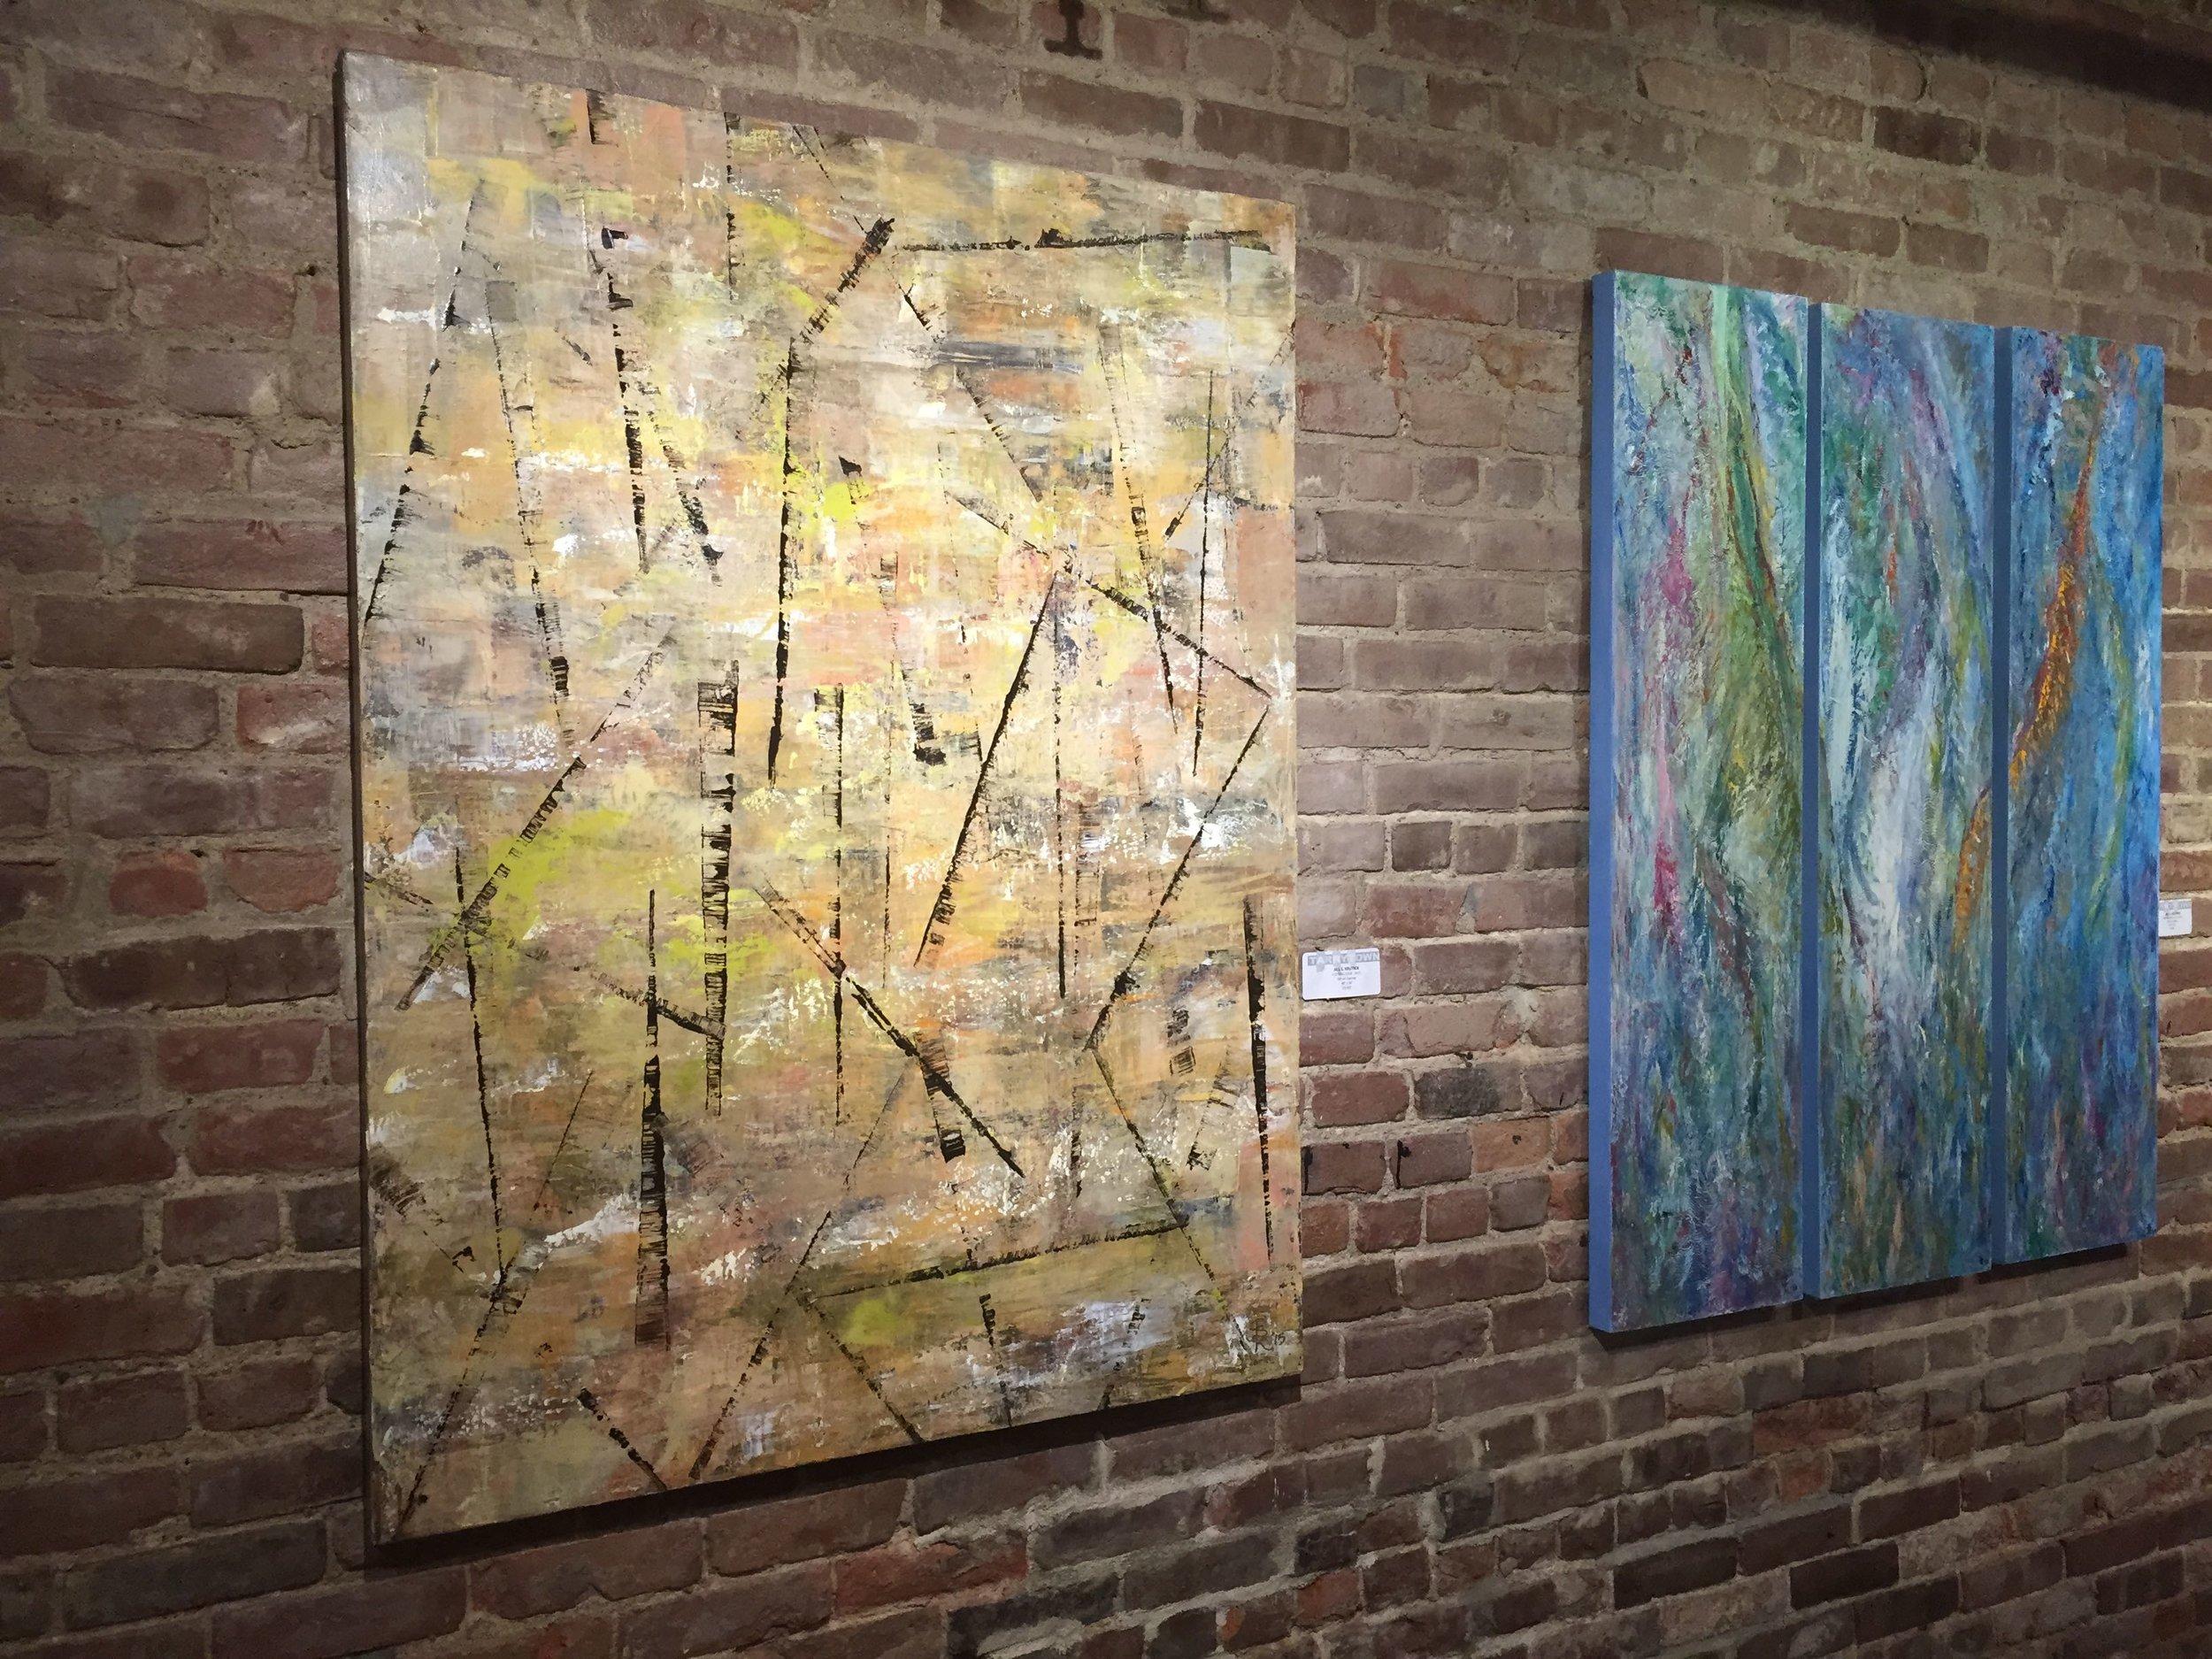 Jill S. Krutick, CUTTING EDGE, 2015 (Left) Oil on canvas, 48 x 36 inches (121.9 x 91.4 cm); PURPLE RAIN, 2013 (Right) Oil on canvas, 48 x 36 inches (121.9 x 91.4 cm). Three panels, 48 x 12 inches (121.9 x 30.5 cm) each.